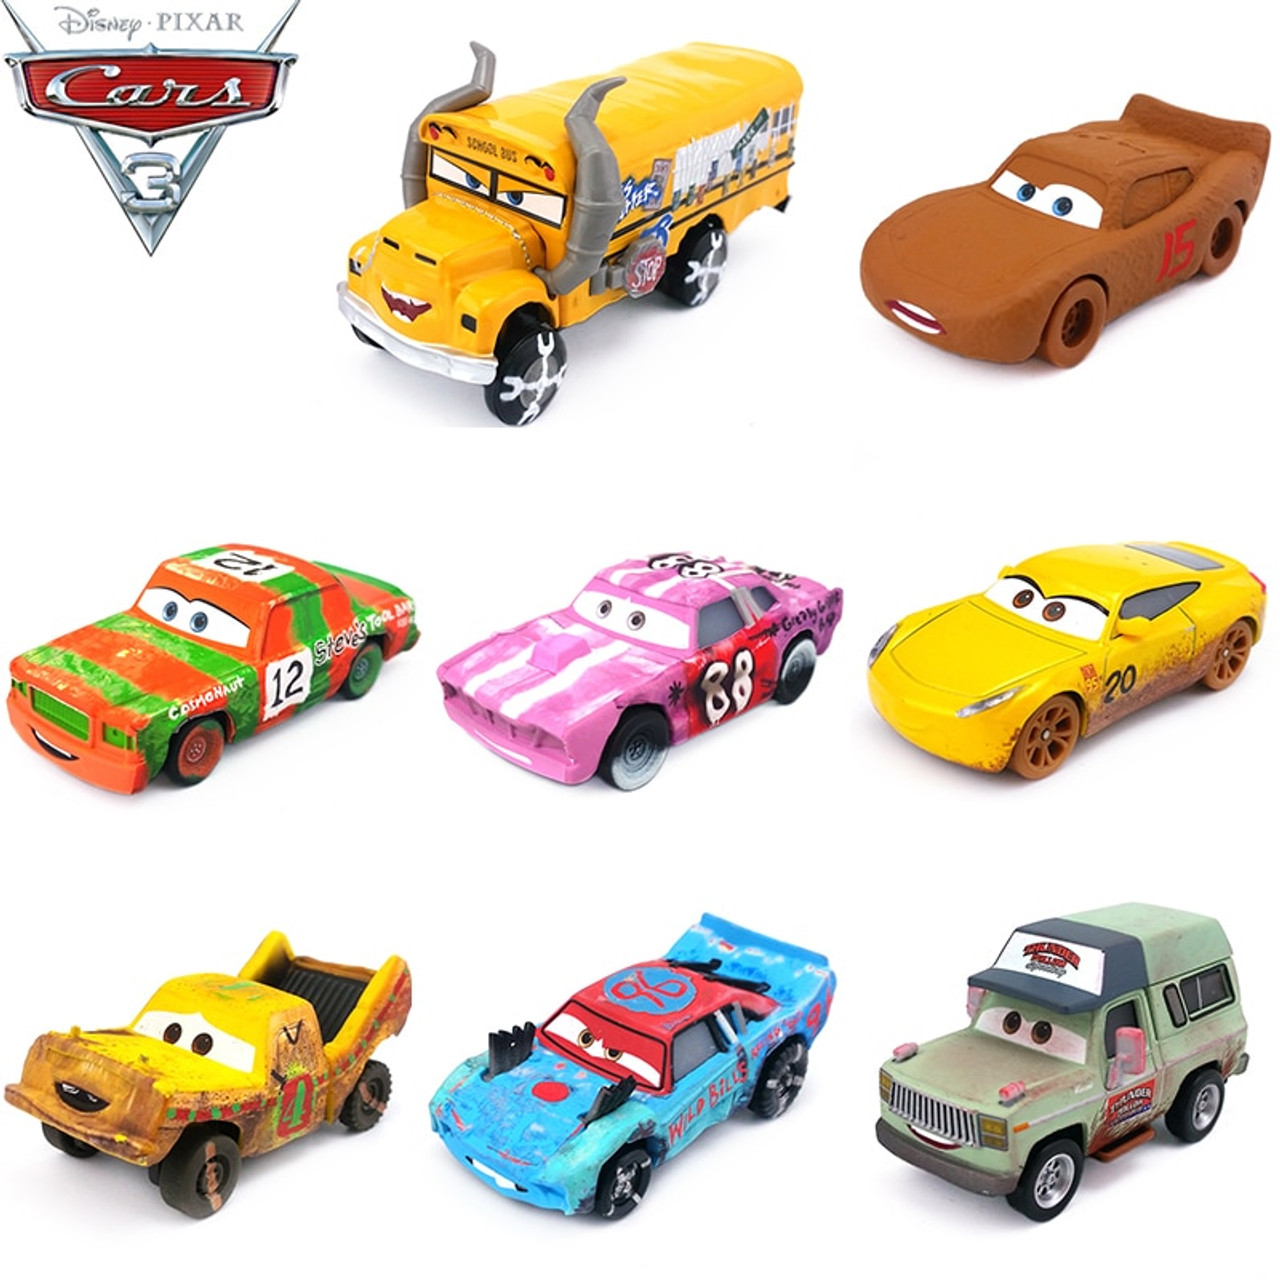 Disney Pixar Cars 2 3 Lightning McQueen Mater Jackson Storm Ramirez 1:55 Diecast